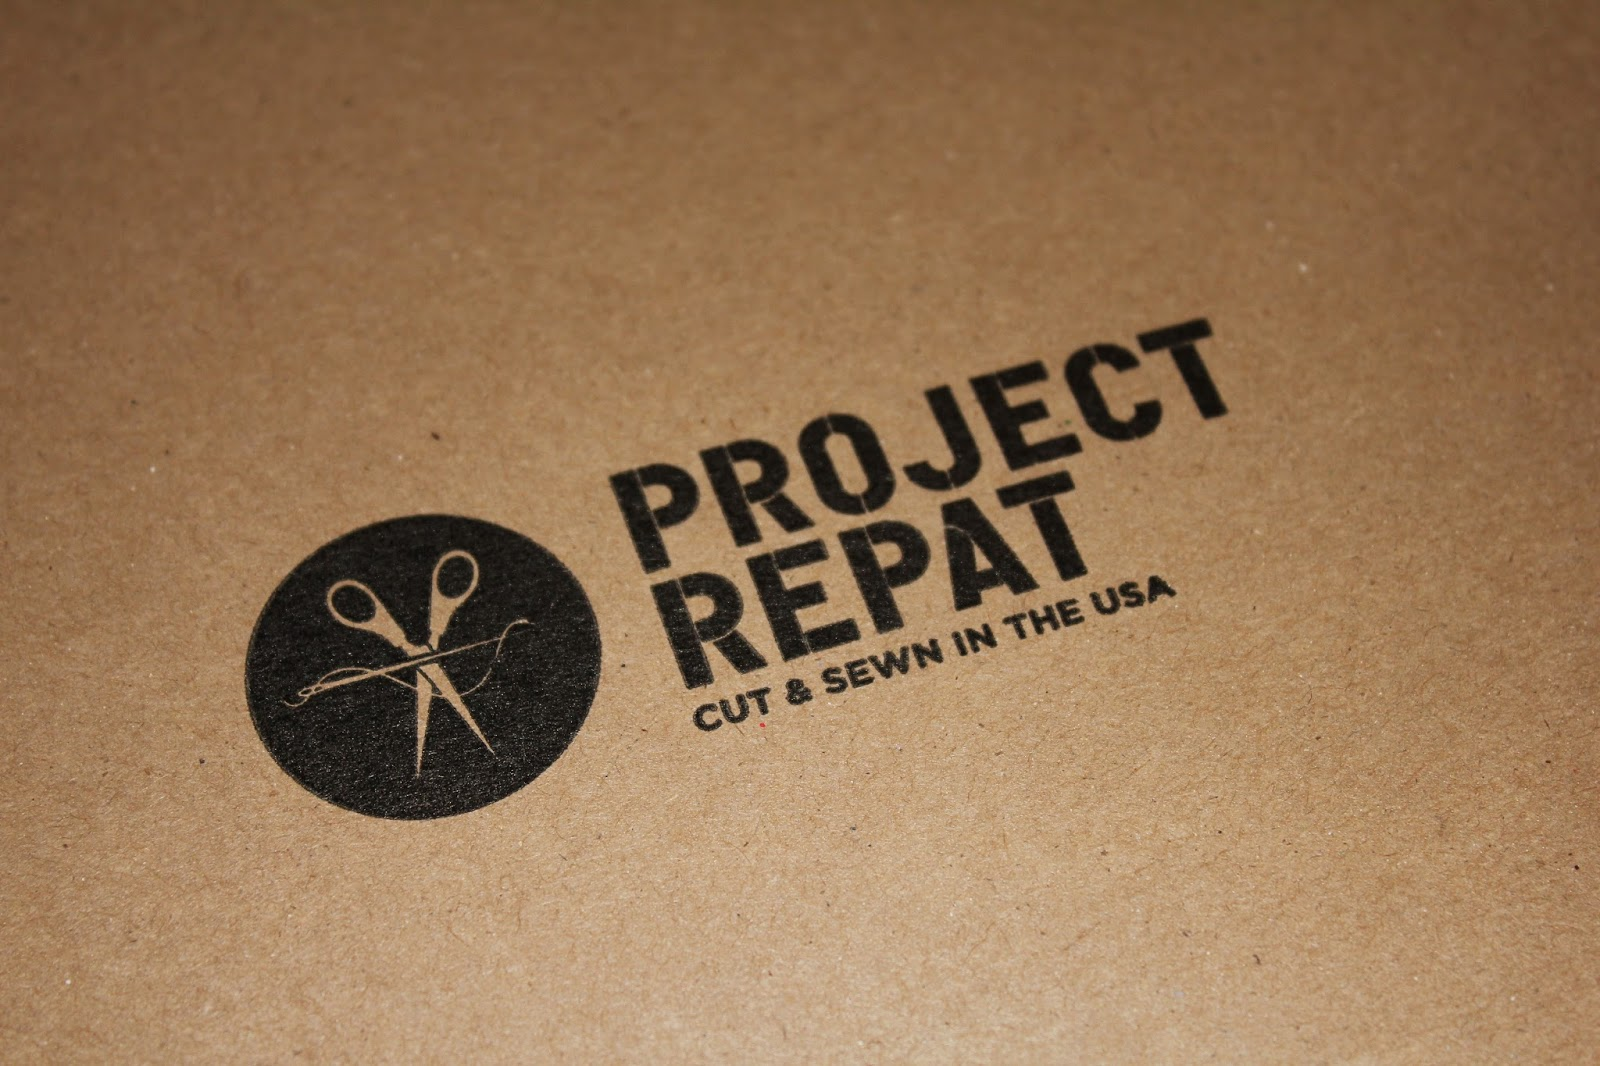 Project Repat Mailer